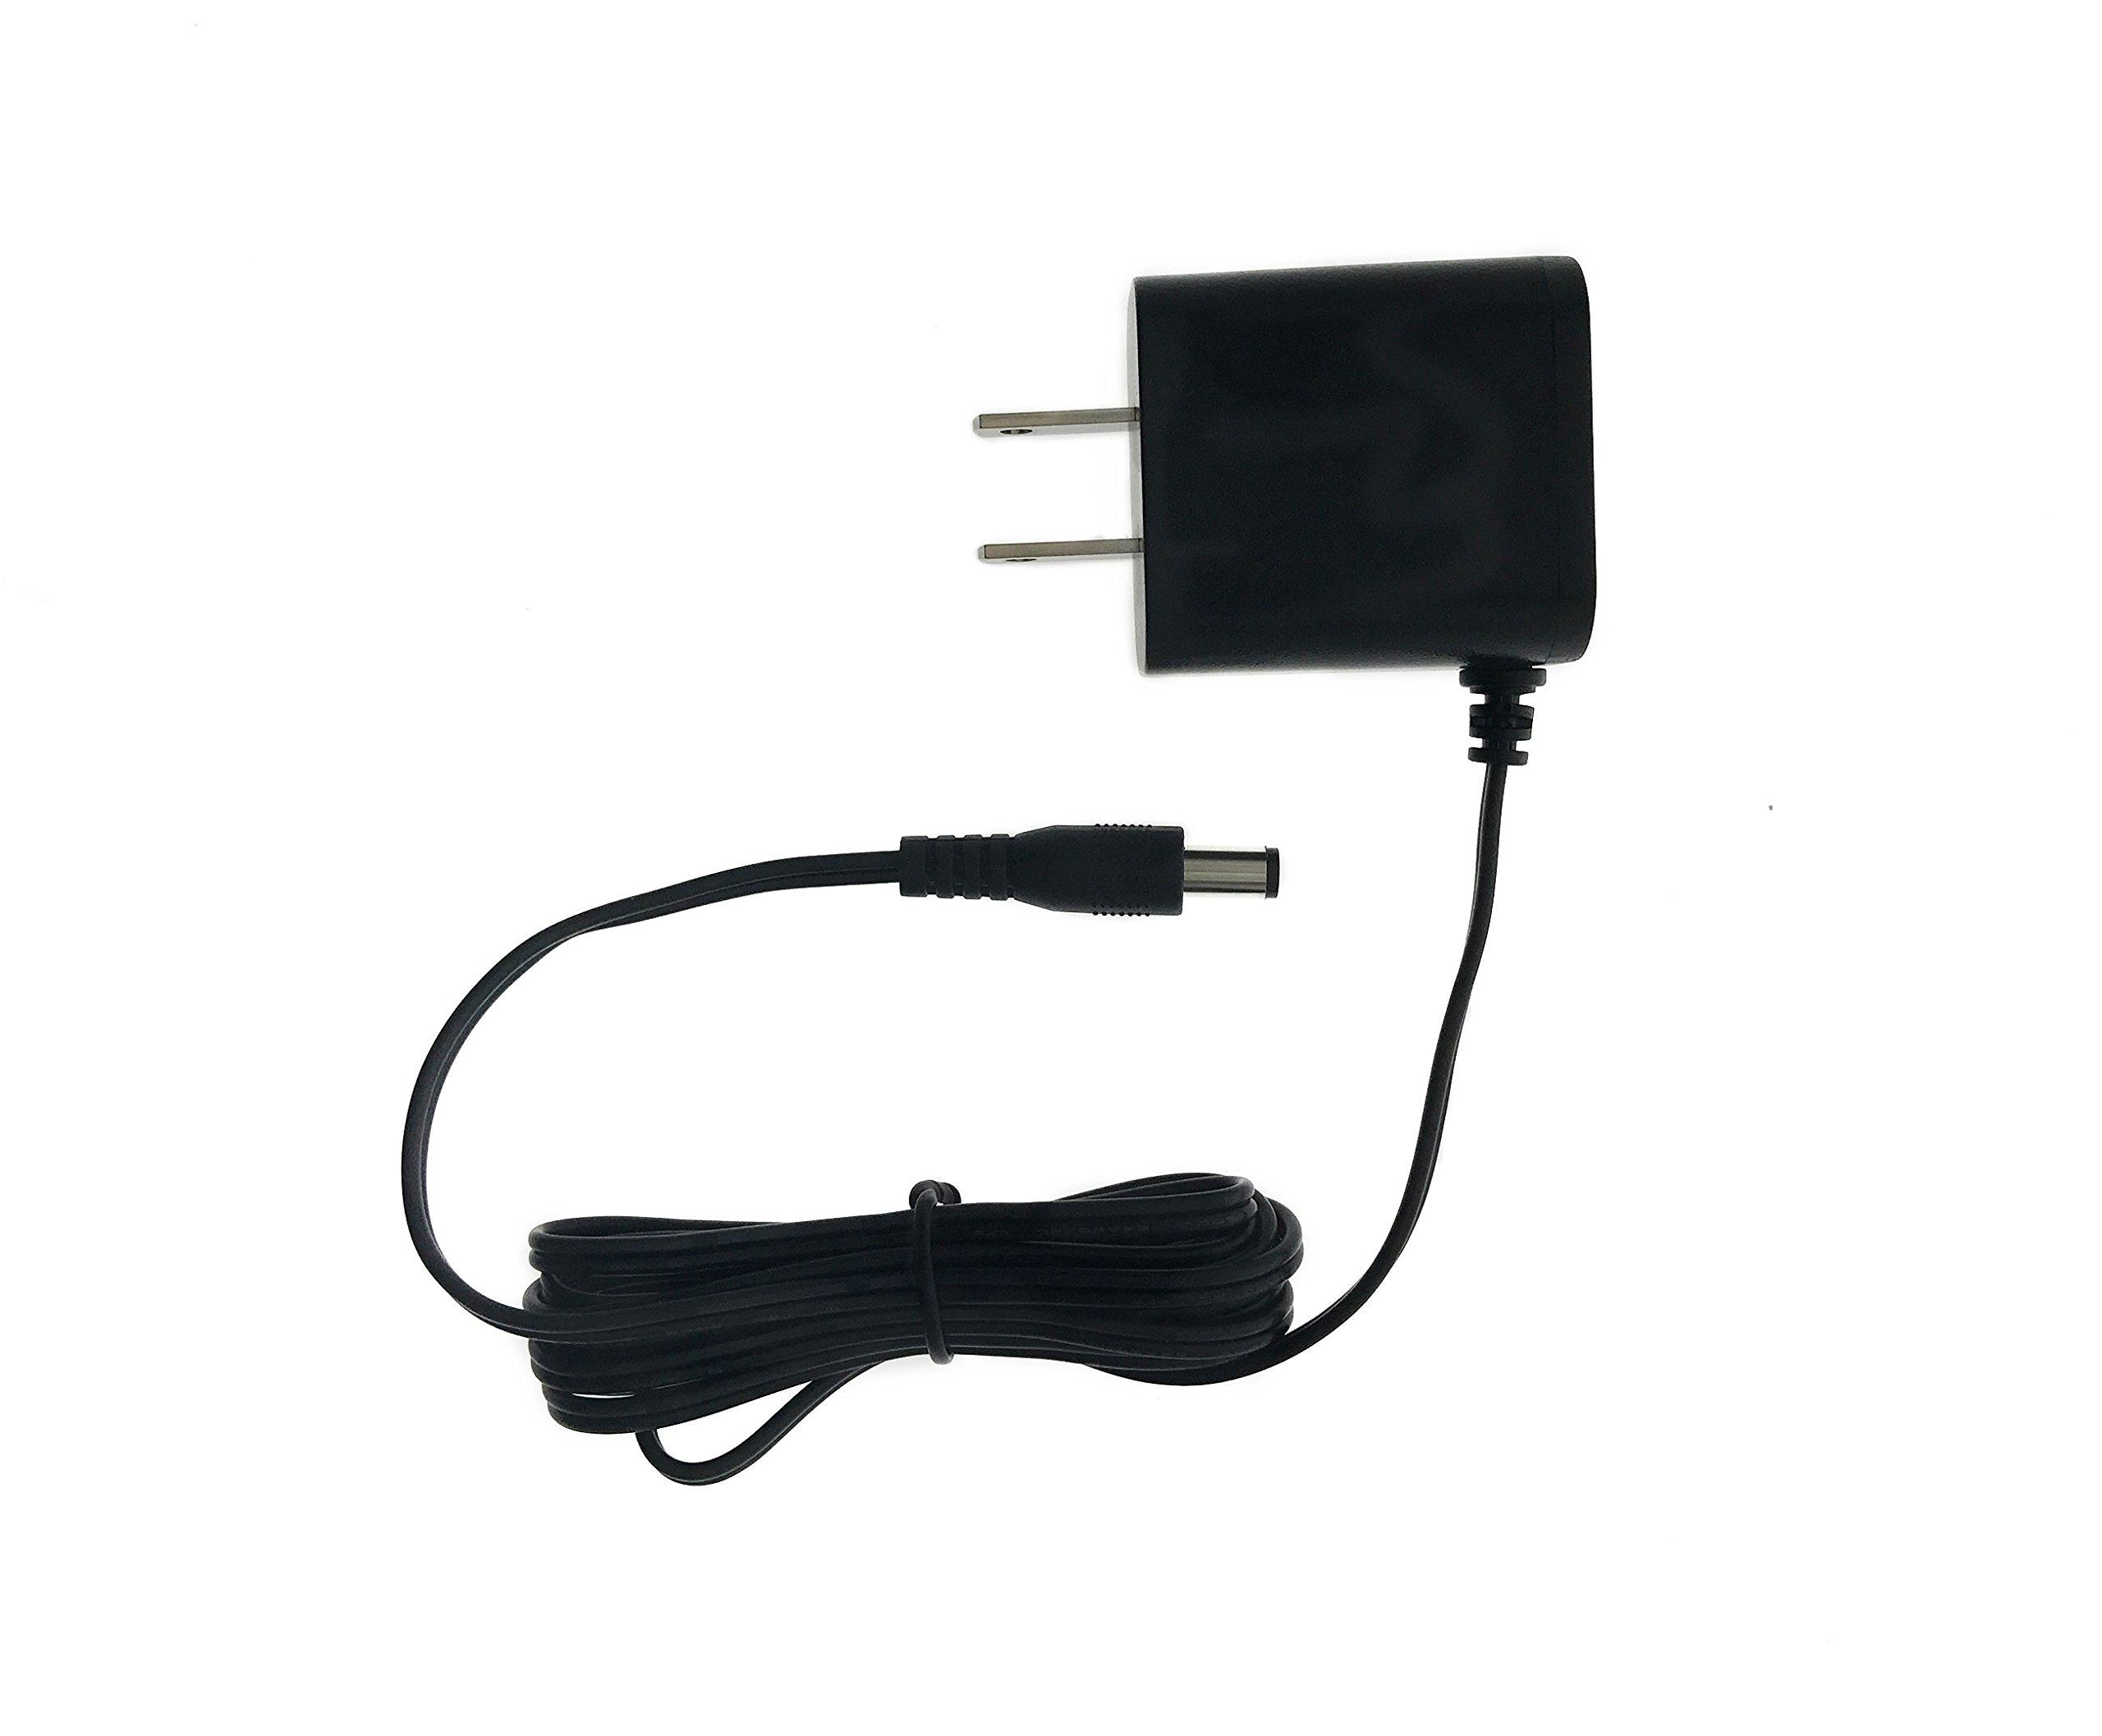 CMVision UL Listed Regulated Power Adapter, 12VDC, 500mA for Camera, LED Light, IR Illuminator (For IR Light model IR3, IR04, IR40, IR30, IRS48)